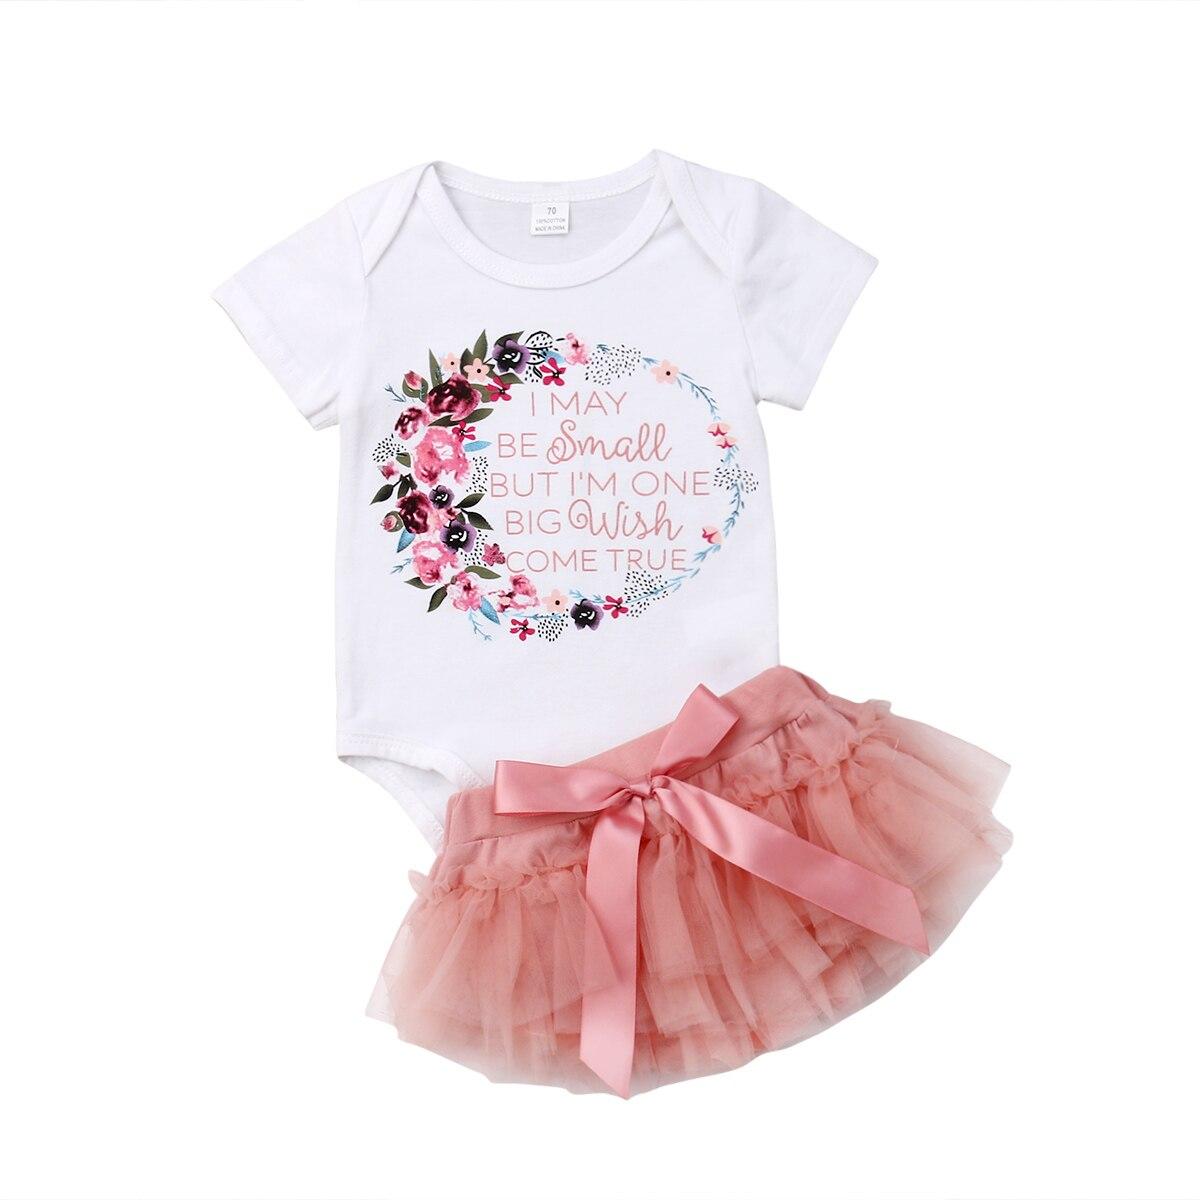 c25548fc4 Pudcoco 2019 Summer Kids Baby Girls Toddler Romper Short Sleeves Tops +  Skirt Tutu Pink 2PCS